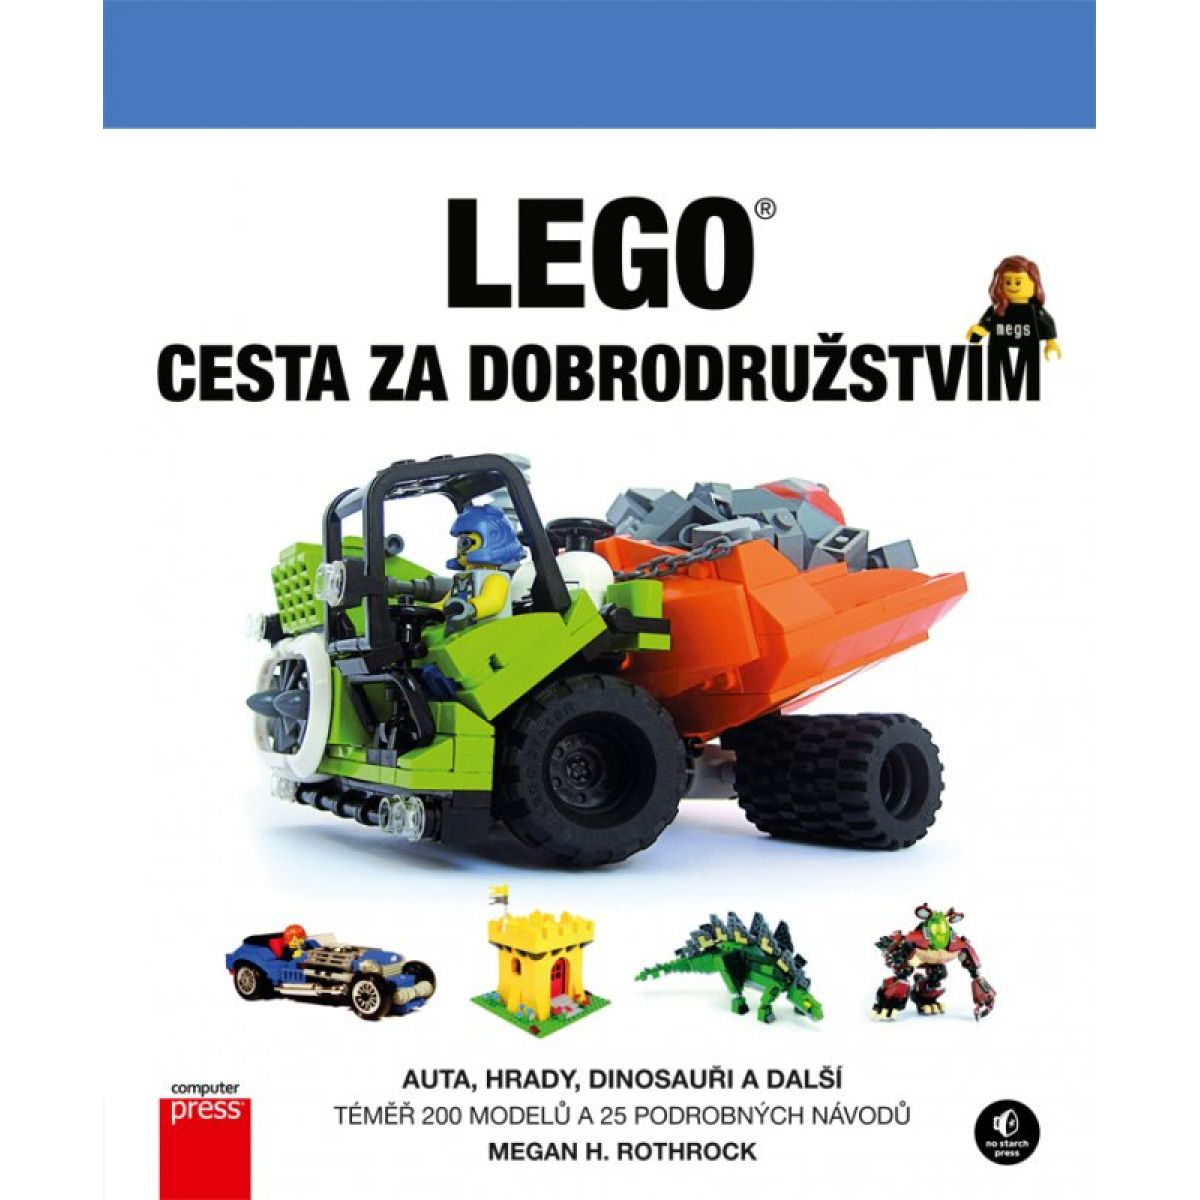 LEGO Cesta za dobrodružstvom 1 Megan Rothrock